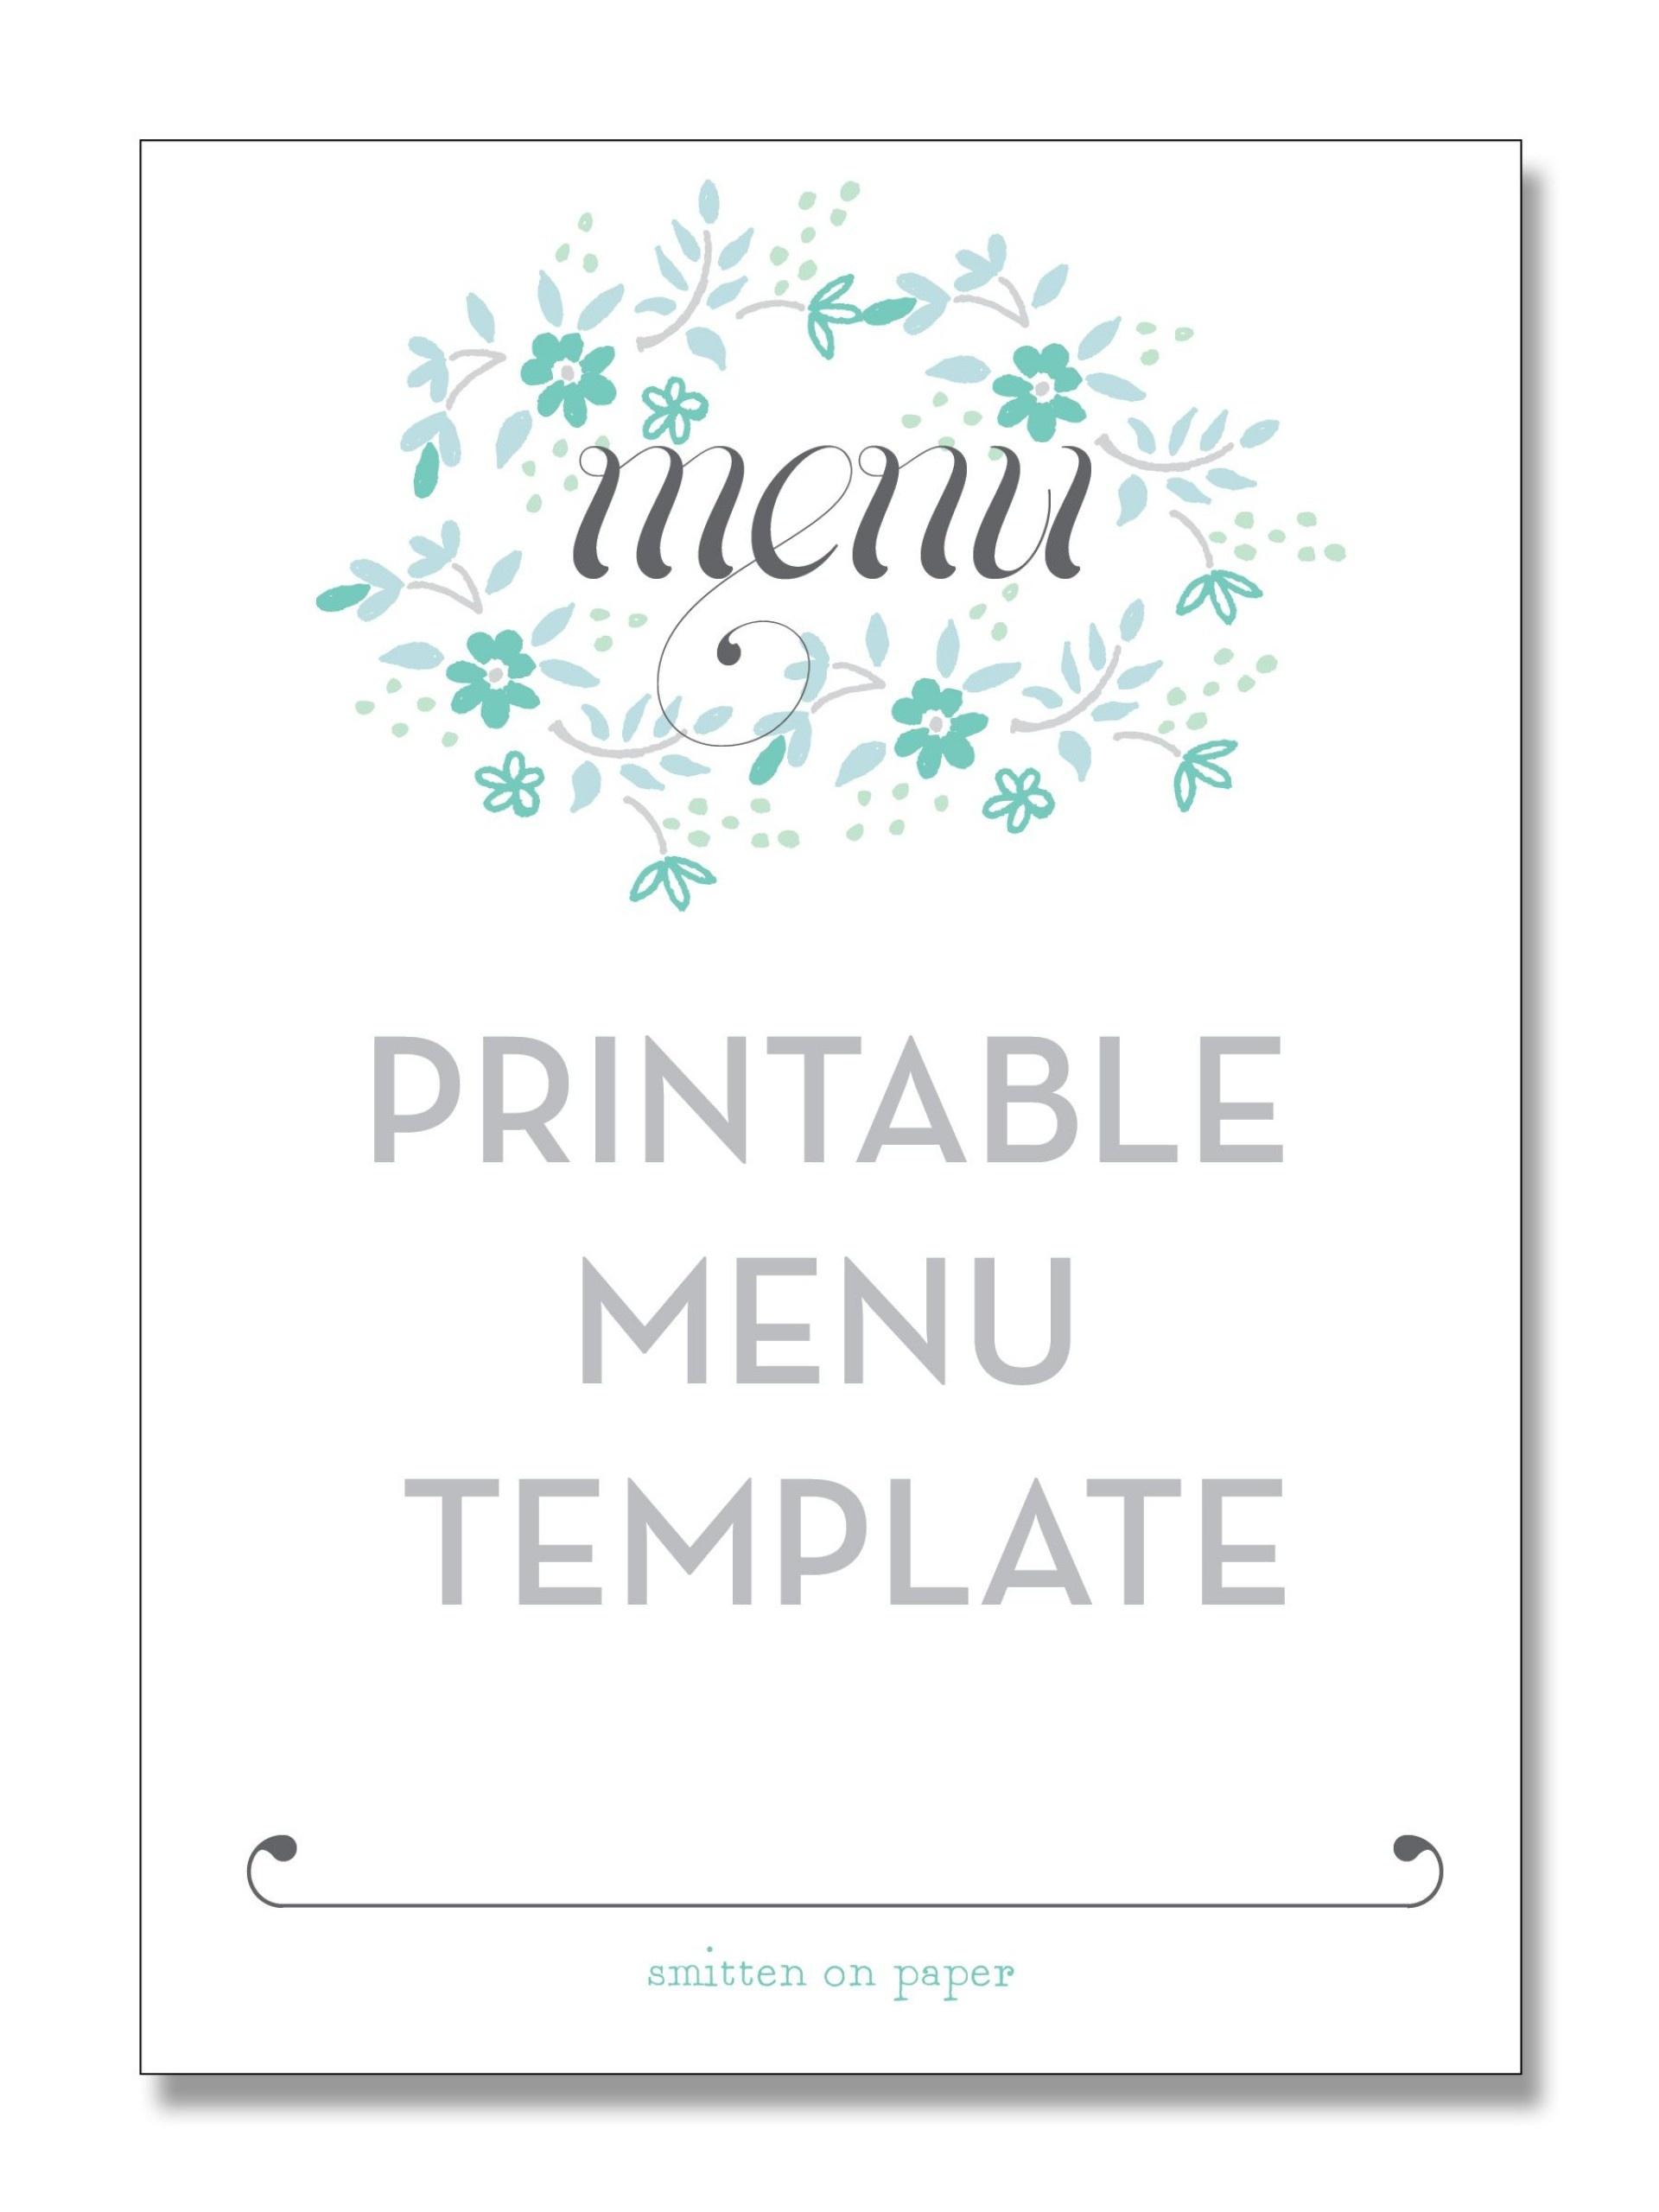 006 Menu Template Free Printable Staggering Ideas Wedding Card - Christmas Menu Printable Template Free